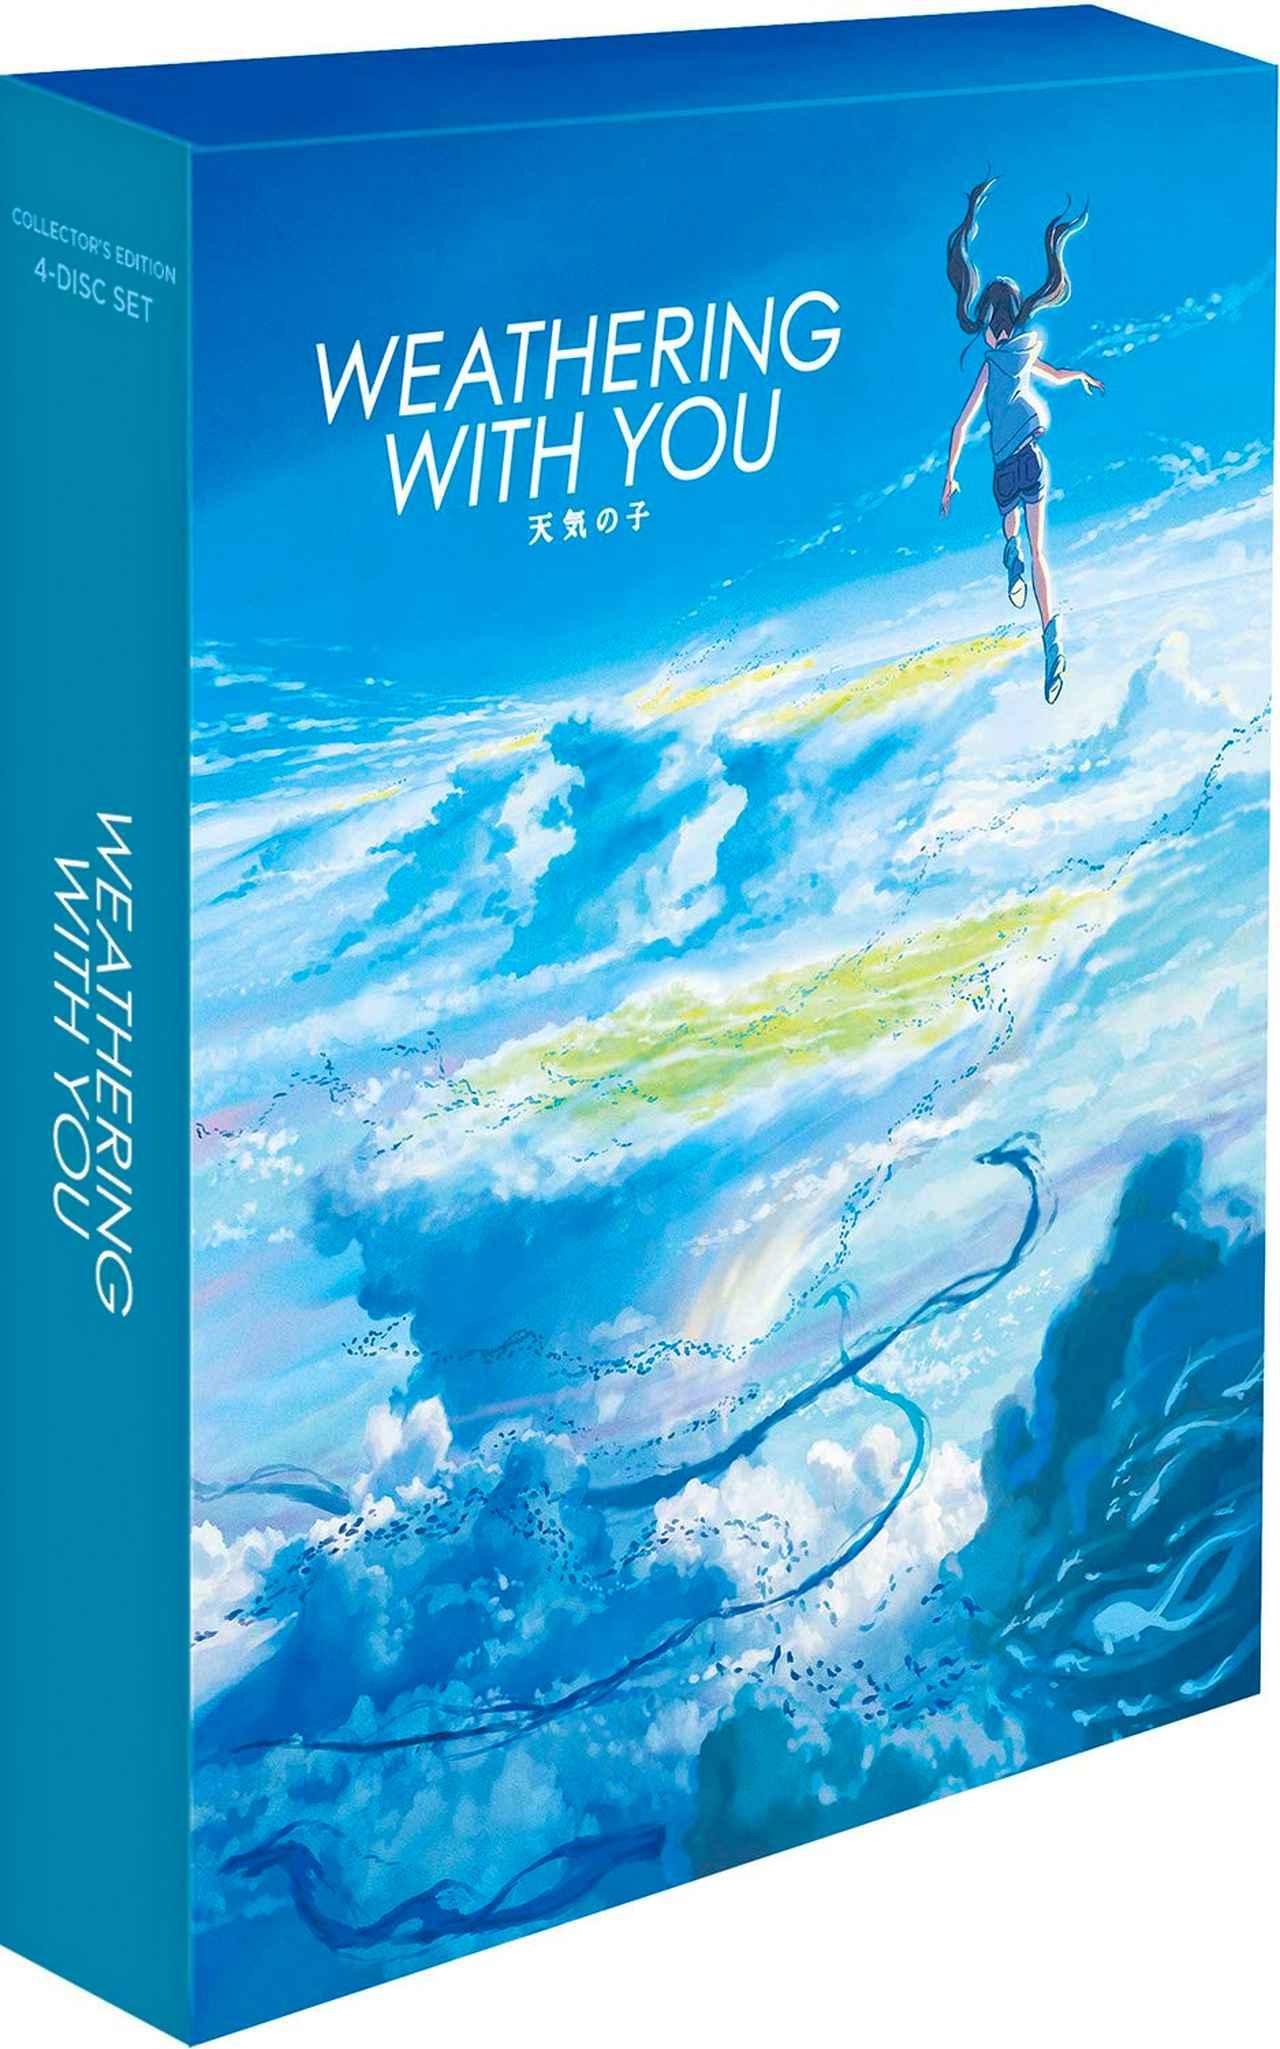 画像: 新海アニメ最新作『天気の子』【海外盤Blu-ray発売情報】